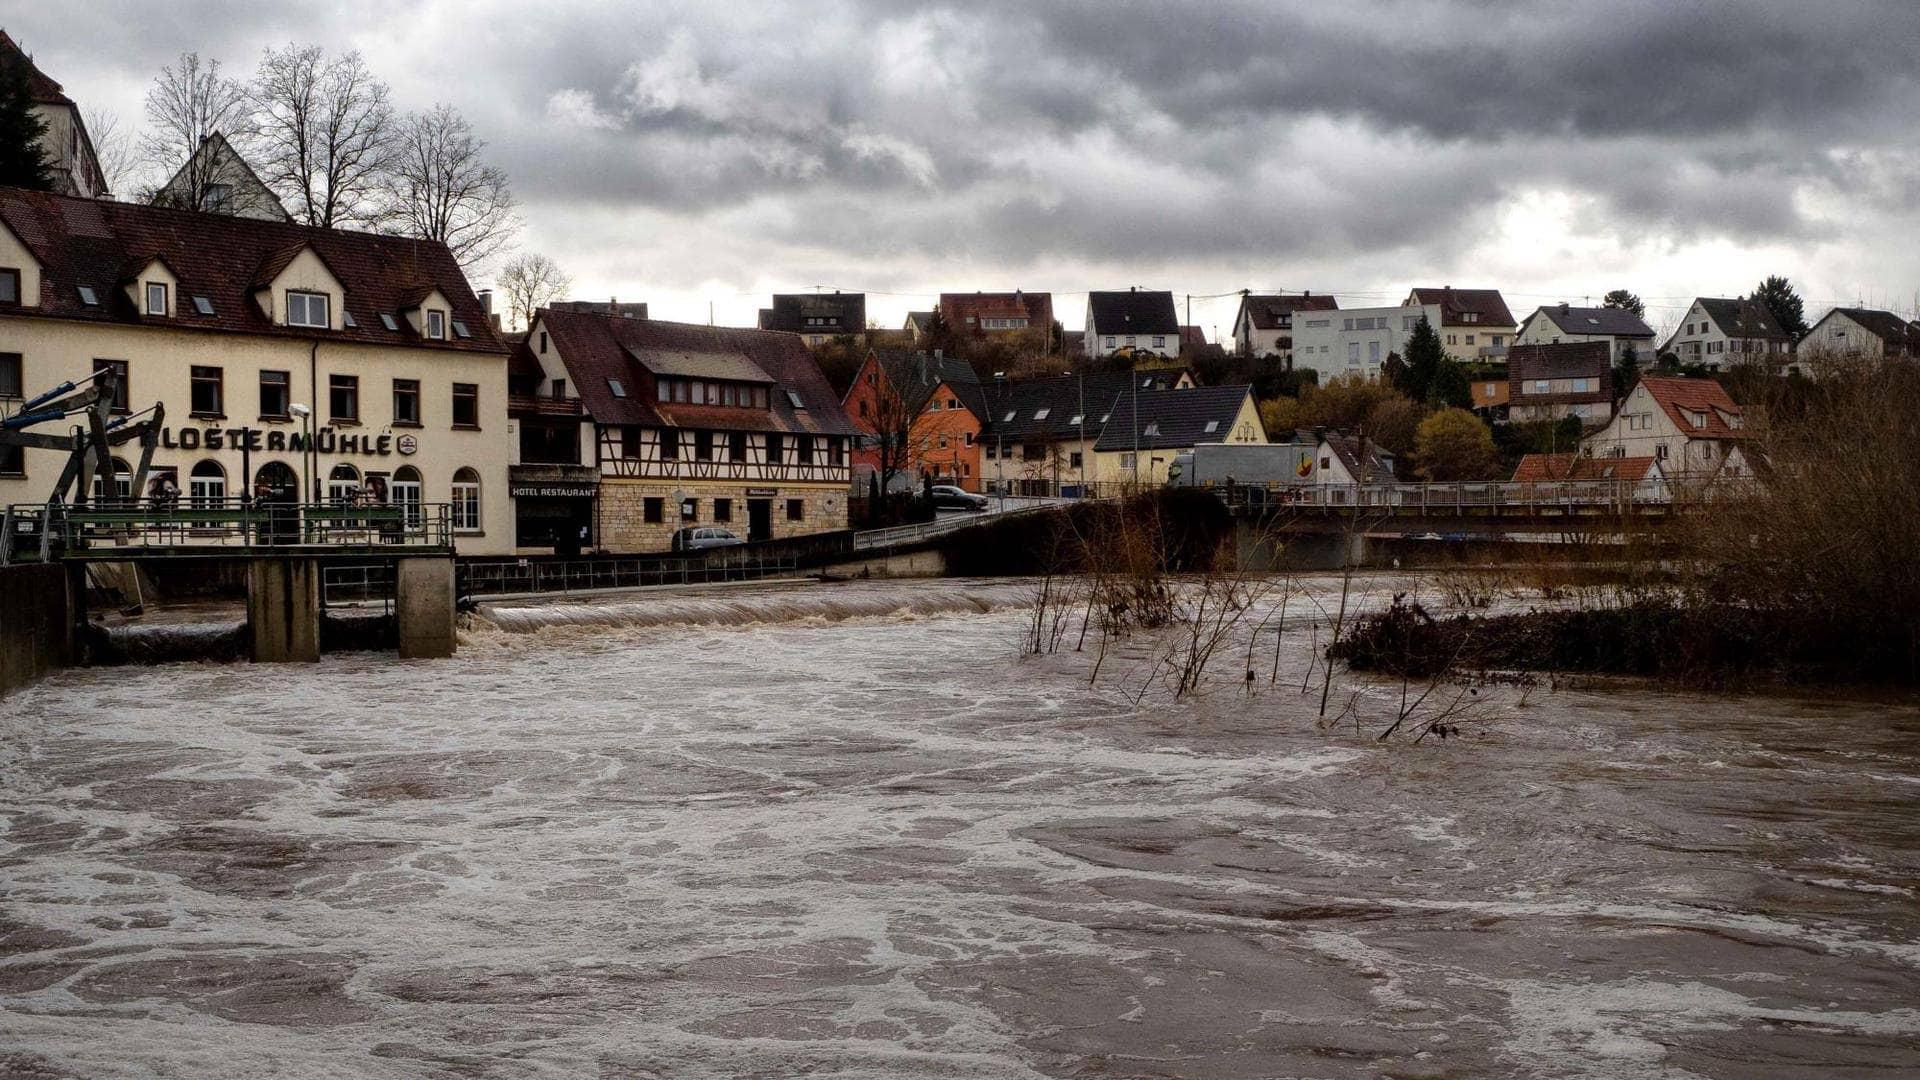 Hochwasser am Neckar